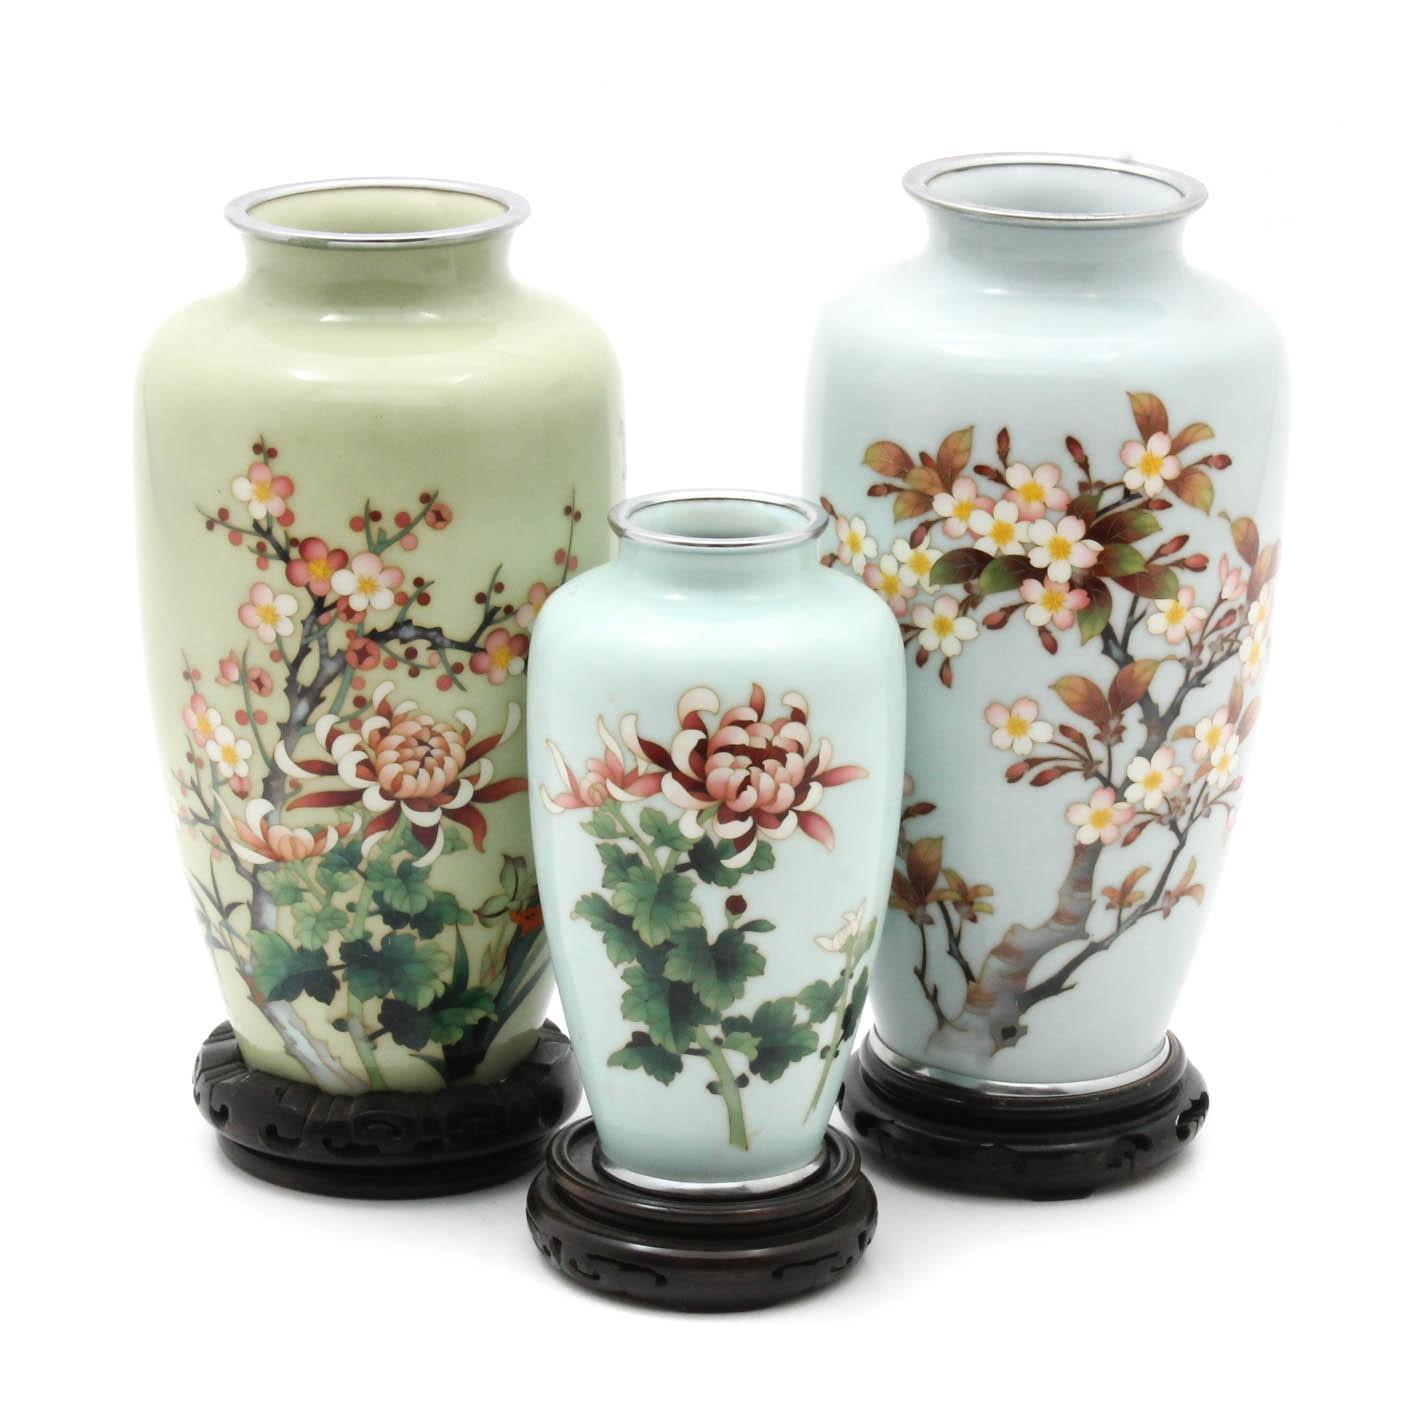 Vintage Japanese Cloisonne Vases